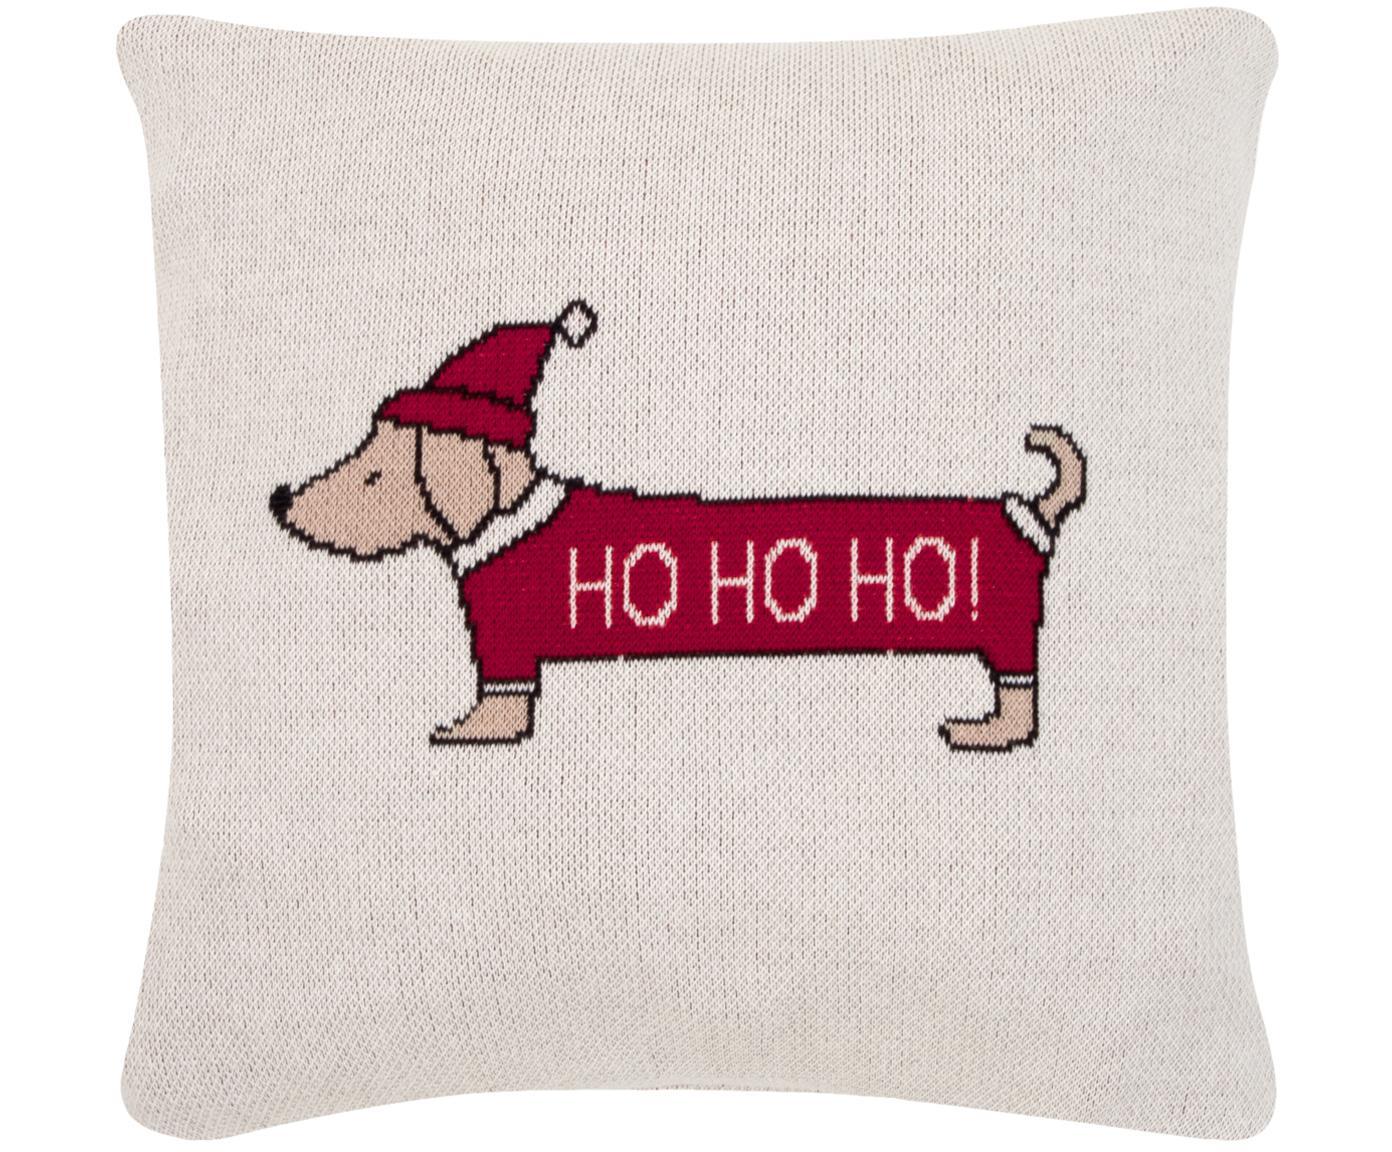 Poszewka na poduszkę ze skóry Santas Little Helper, 100% bawełna, Wielobarwny, S 40 x D 40 cm